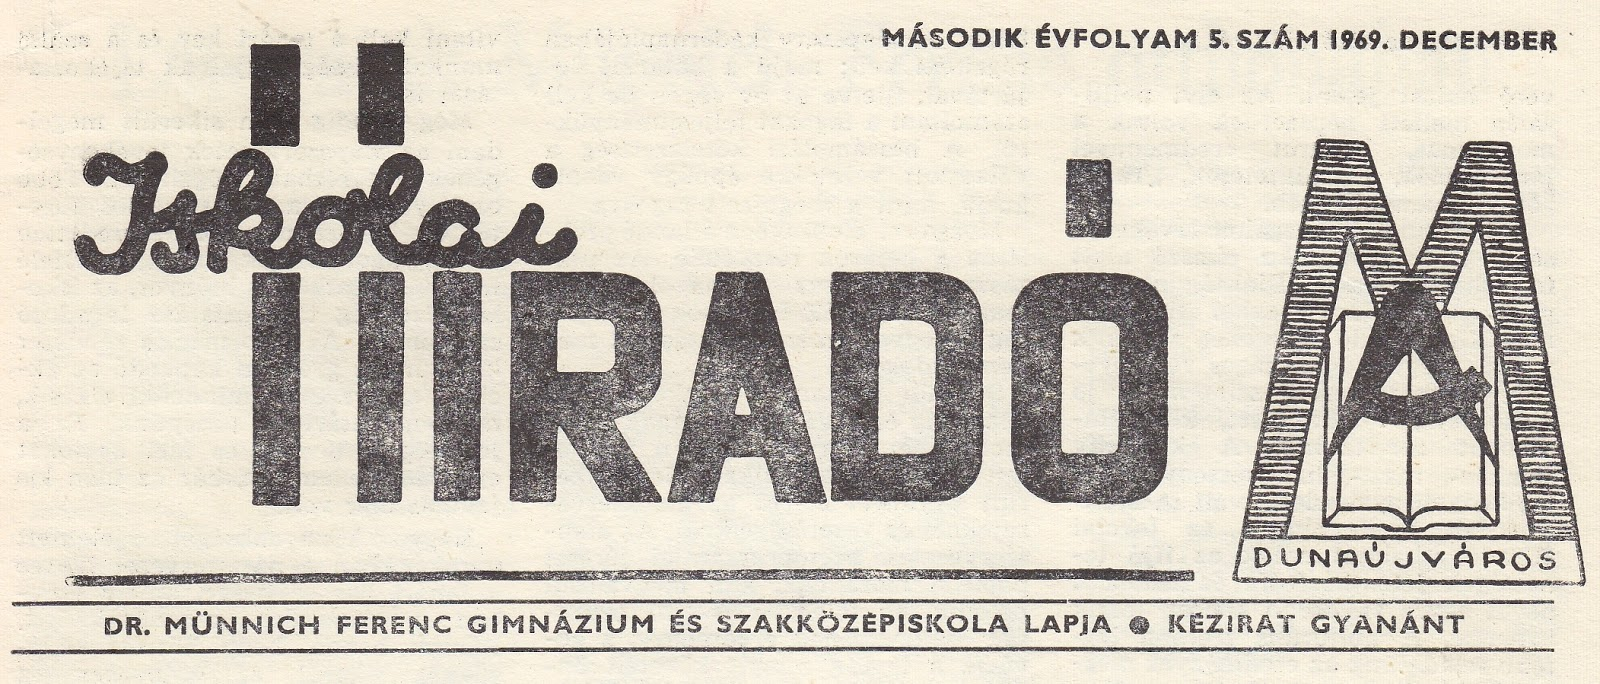 Iskolai híradó – 1969 december